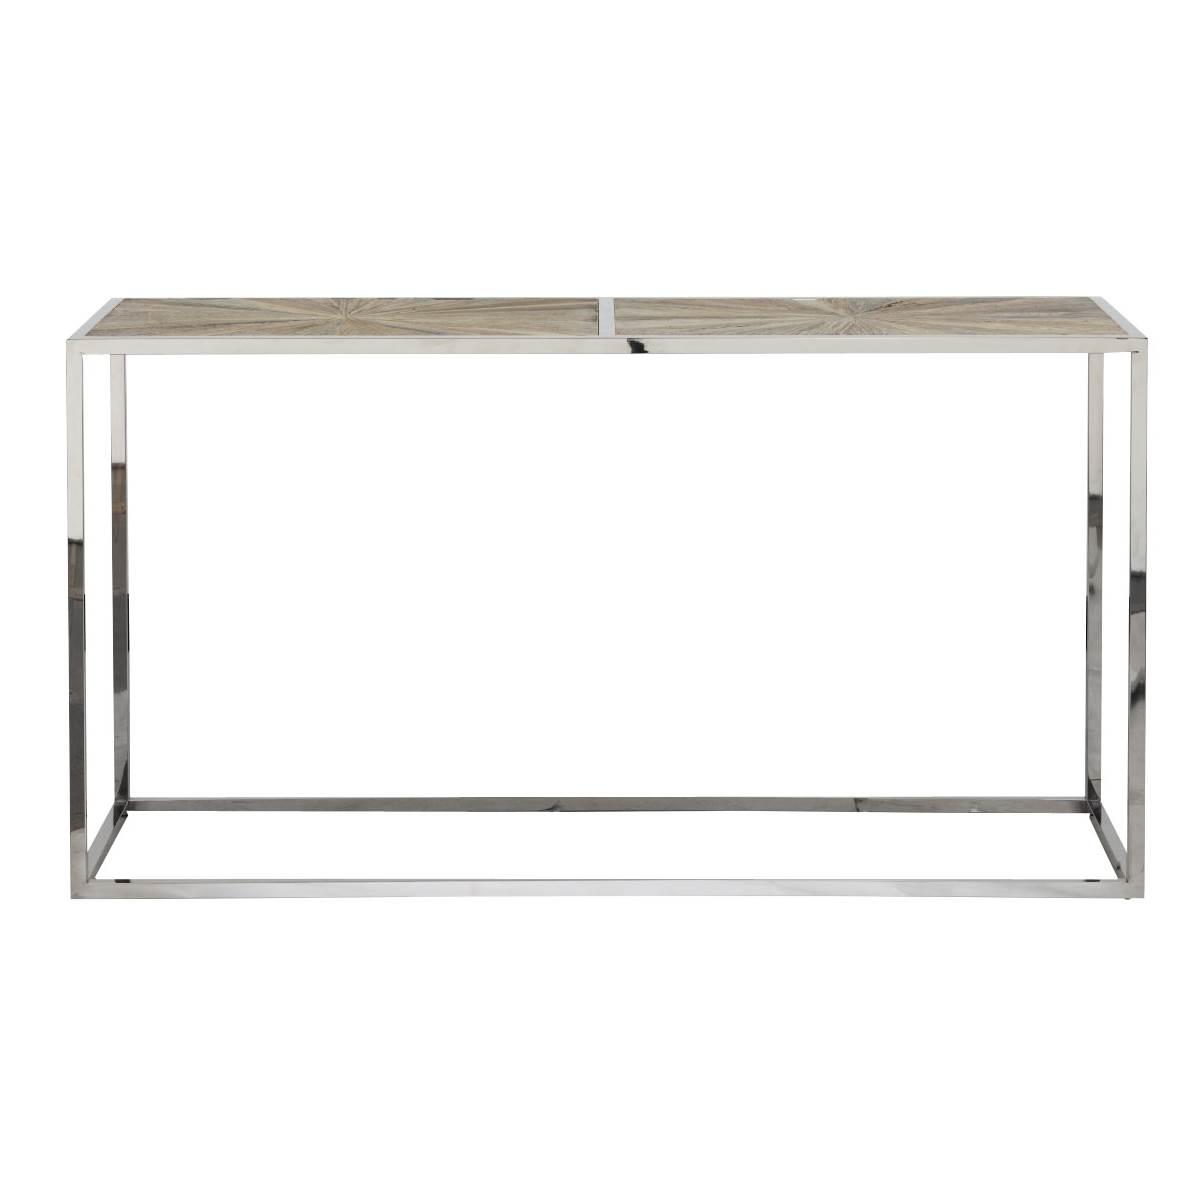 Parquet Console Table - Smoke Gray - 1